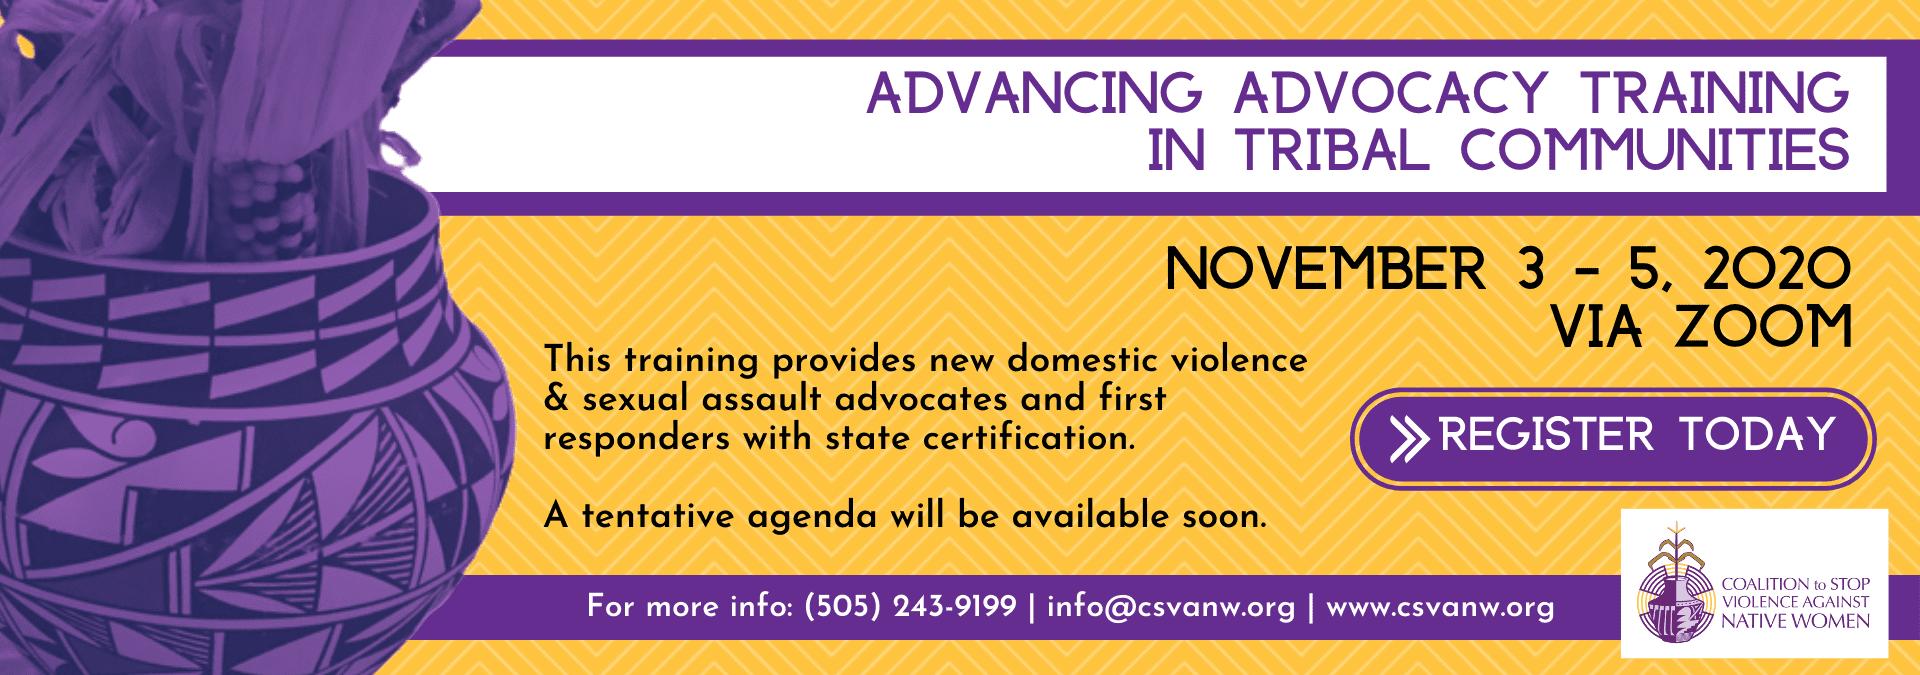 2020 CSVANW Training & Event Banners-5